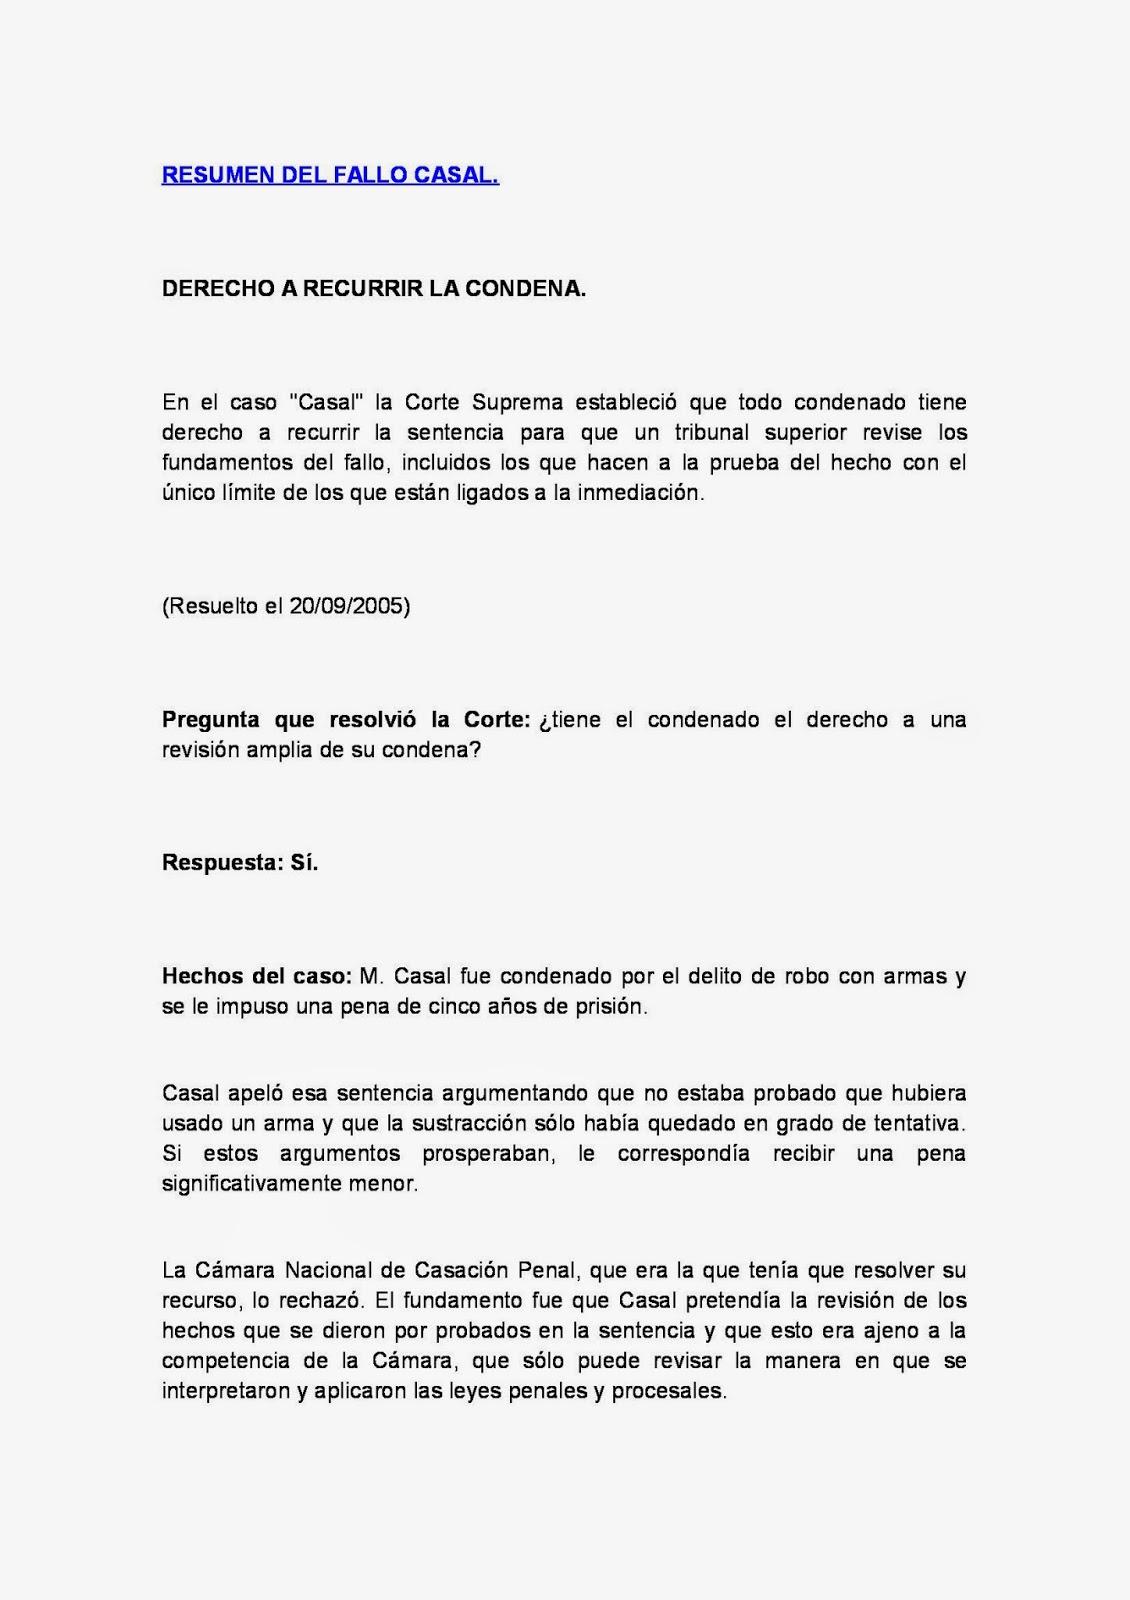 RESUMEN DE FALLOS: RESUMEN DEL FALLO CASAL